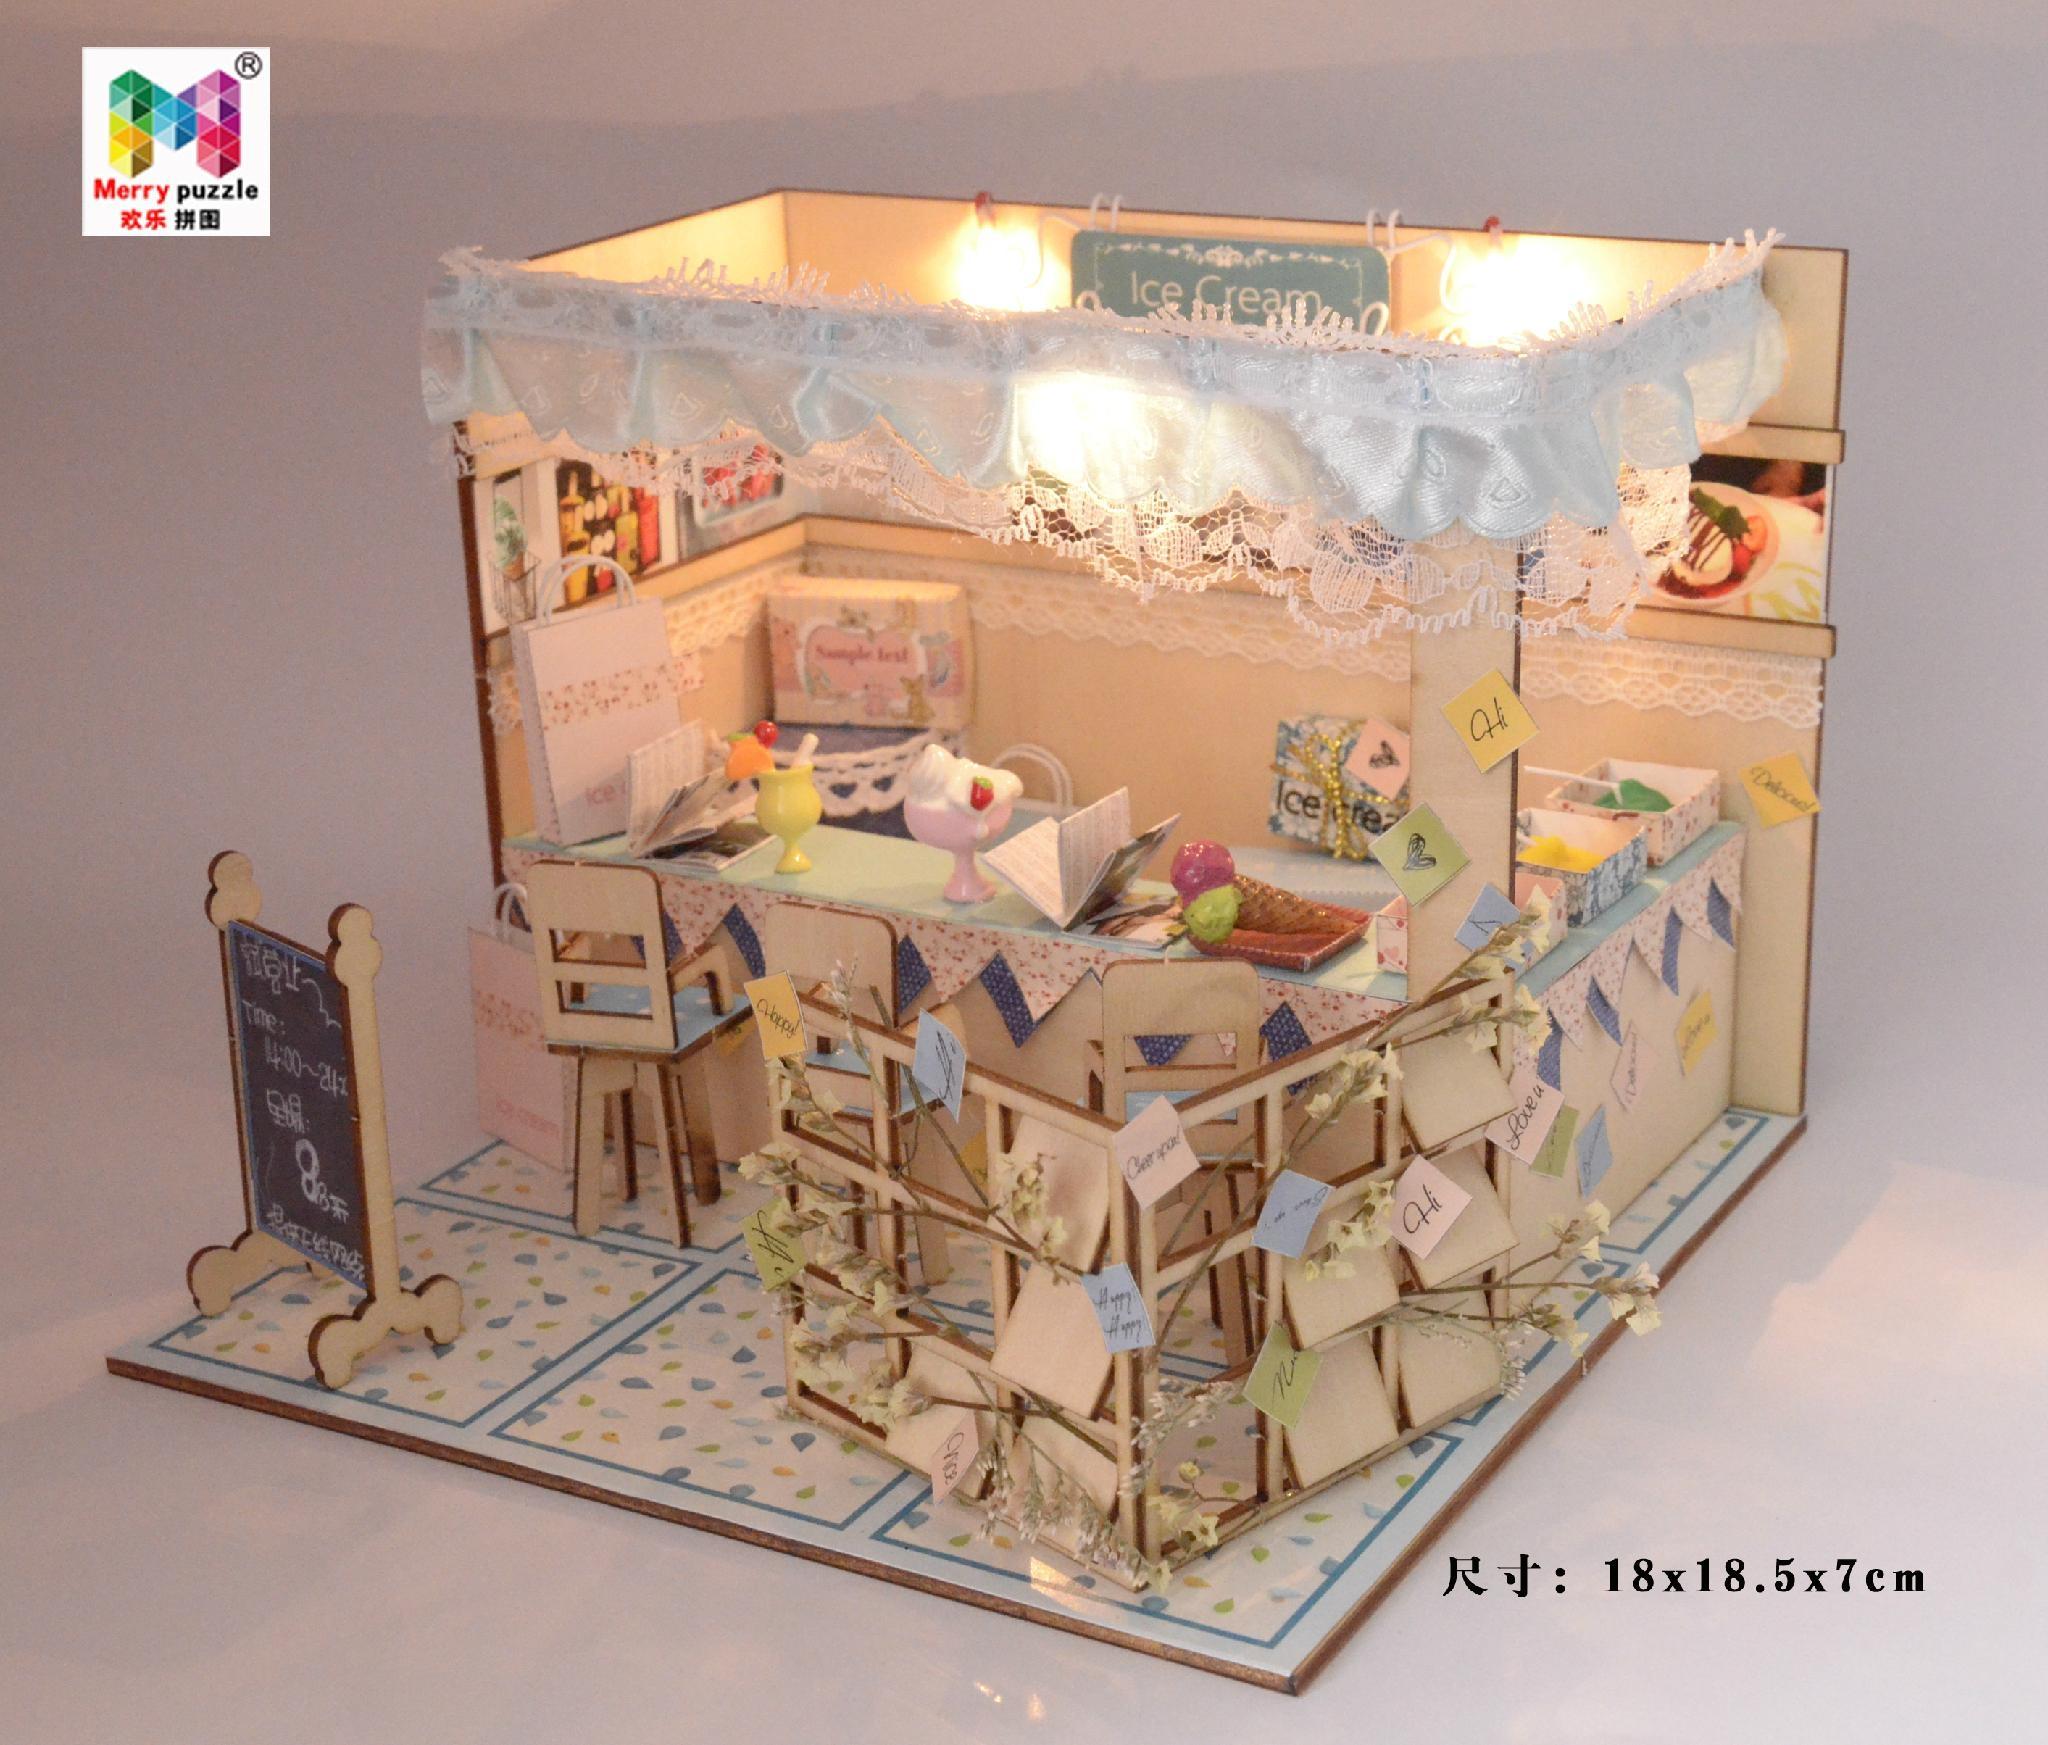 Ice cream house   plan toy   model building   DIY house  wooden  art 4